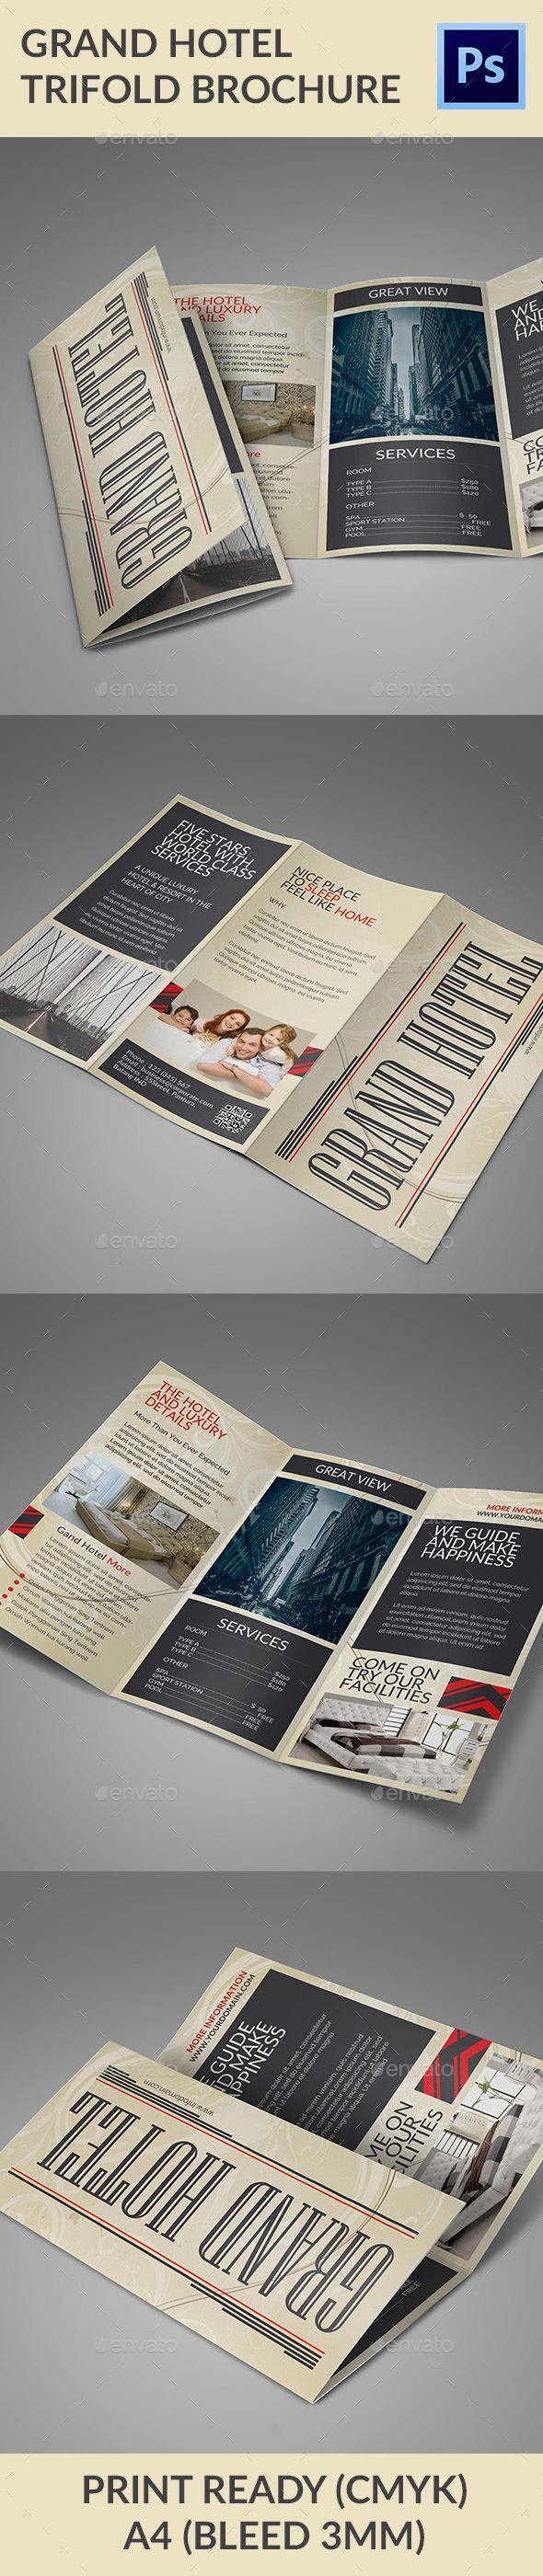 Grand Hotel Trifold Brochure